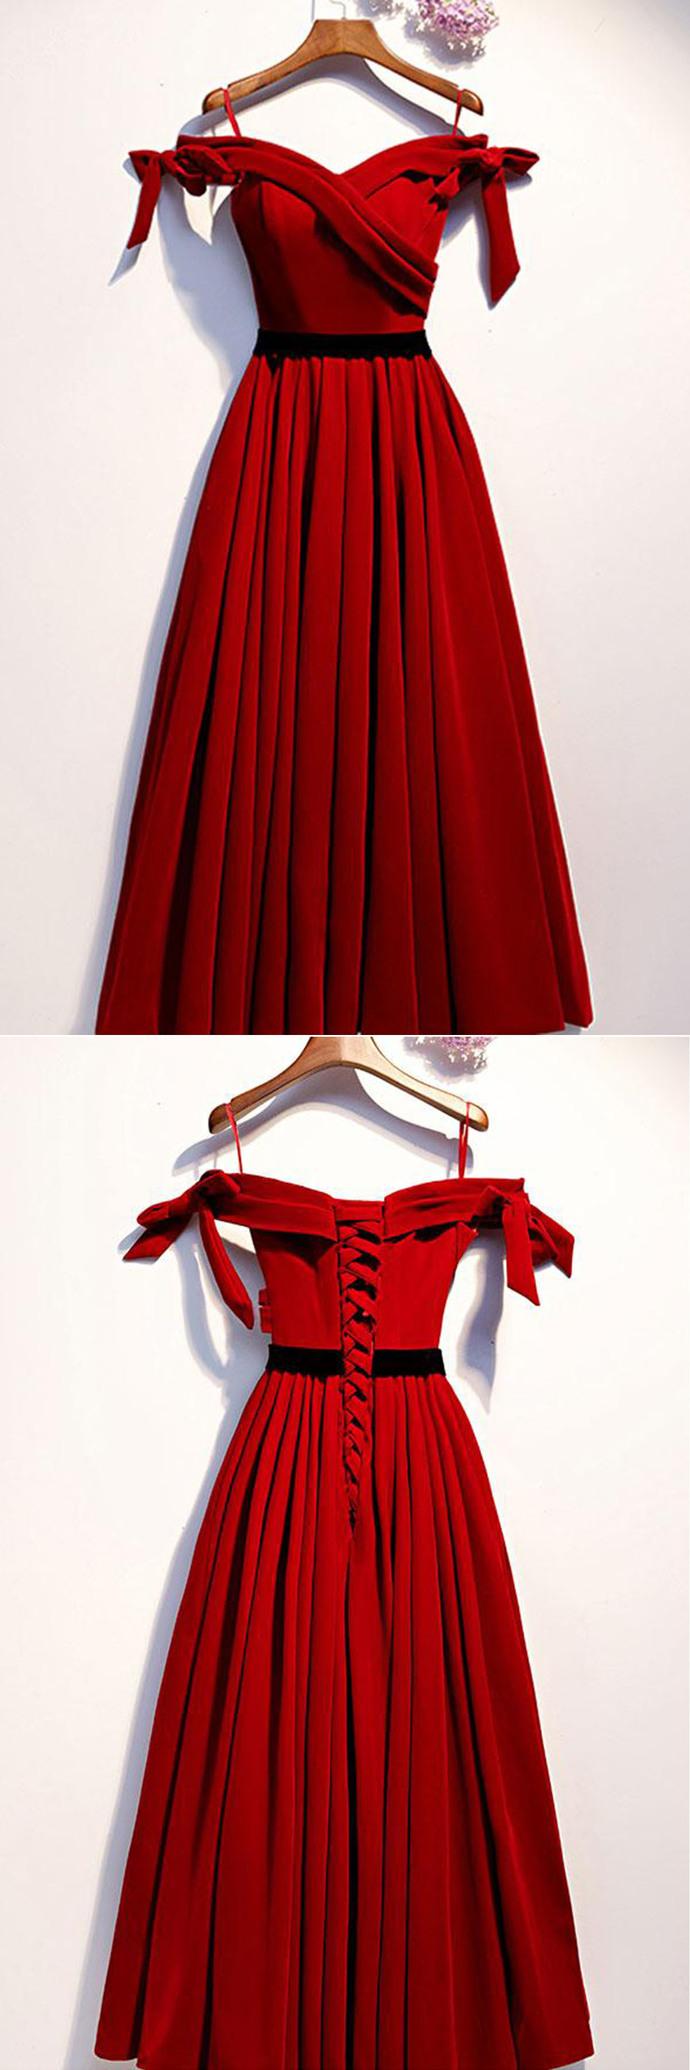 Simple Burgundy Satin Off Shoulder Tea Length Party Dress, Prom Dress D-073